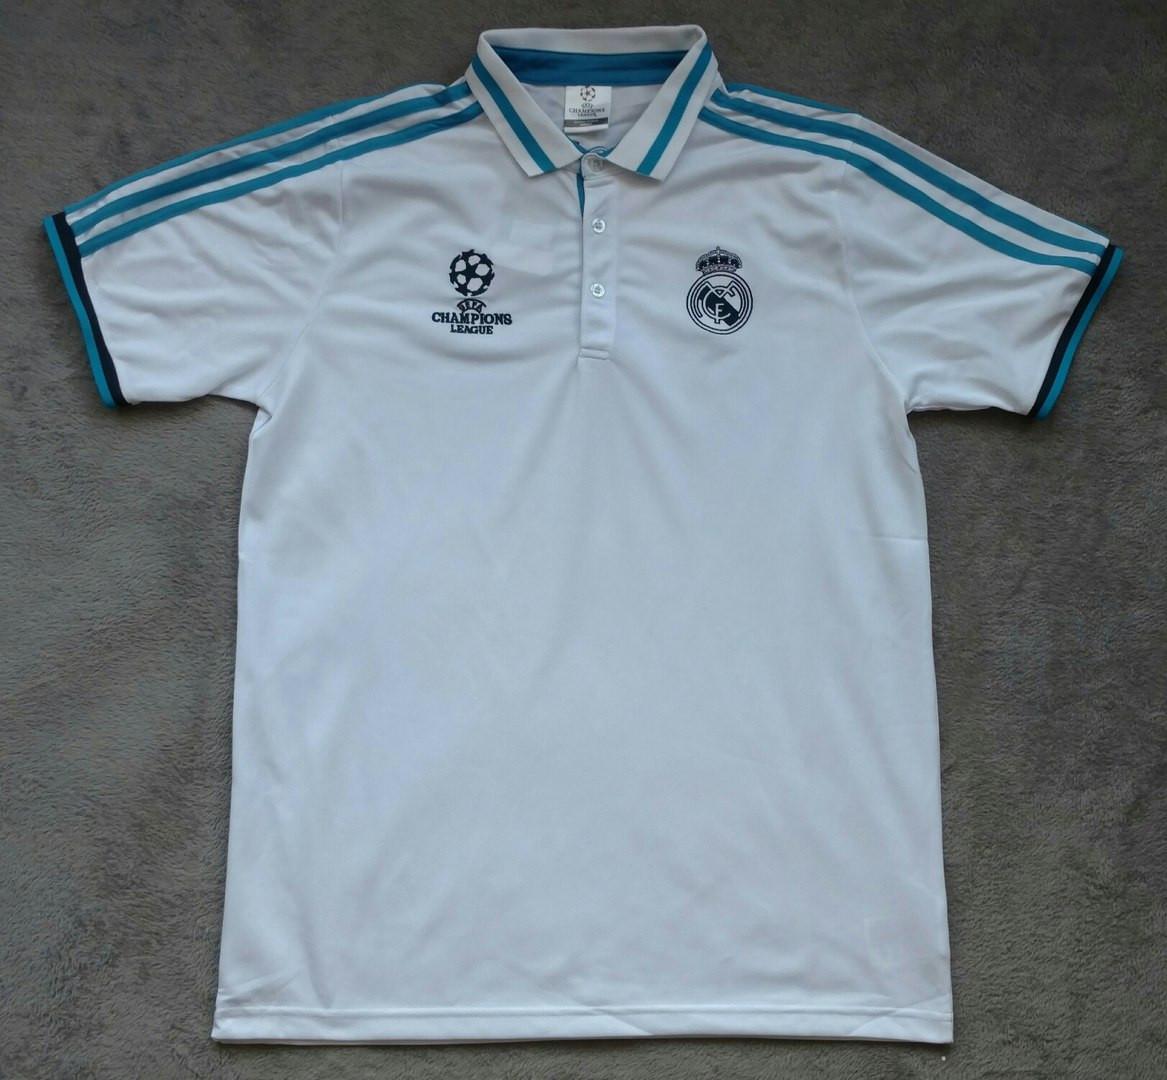 Поло футболка Реал Мадрид с пуговицами белая